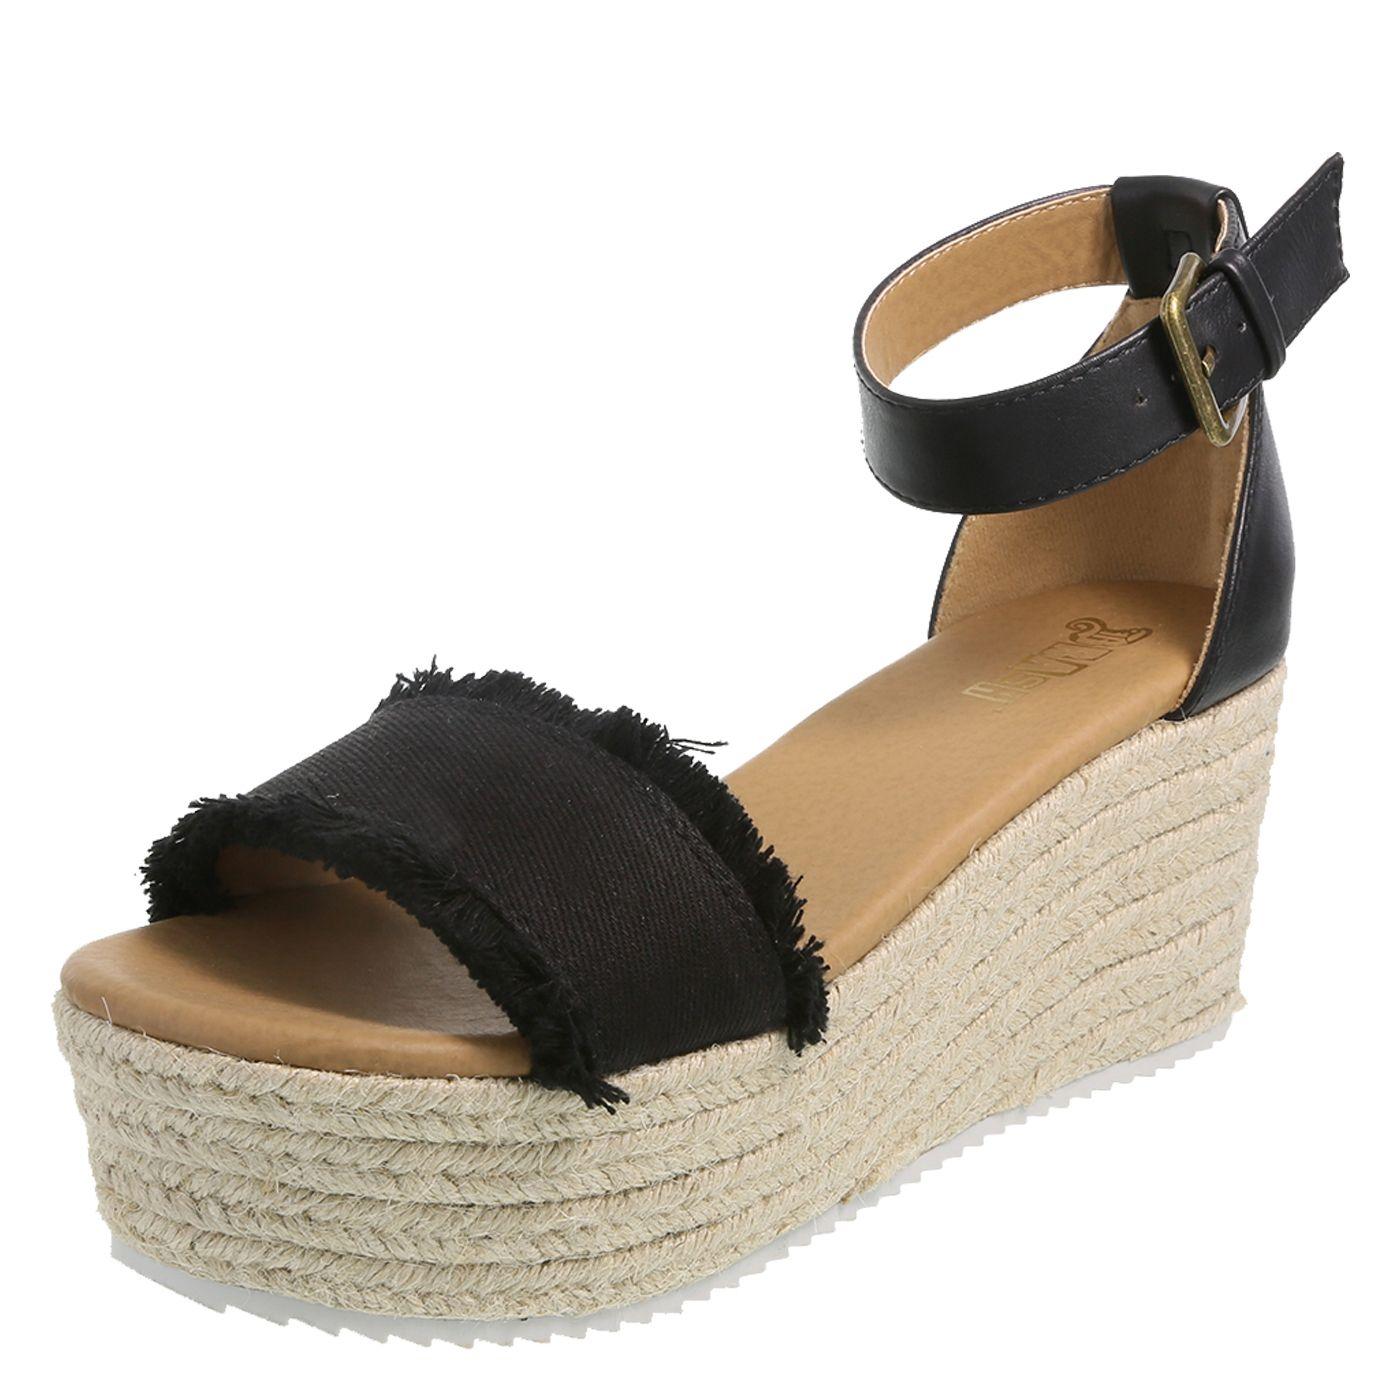 b1a2077815b0 Brash Tessa Women s Platform Wedge Sandal Shoe